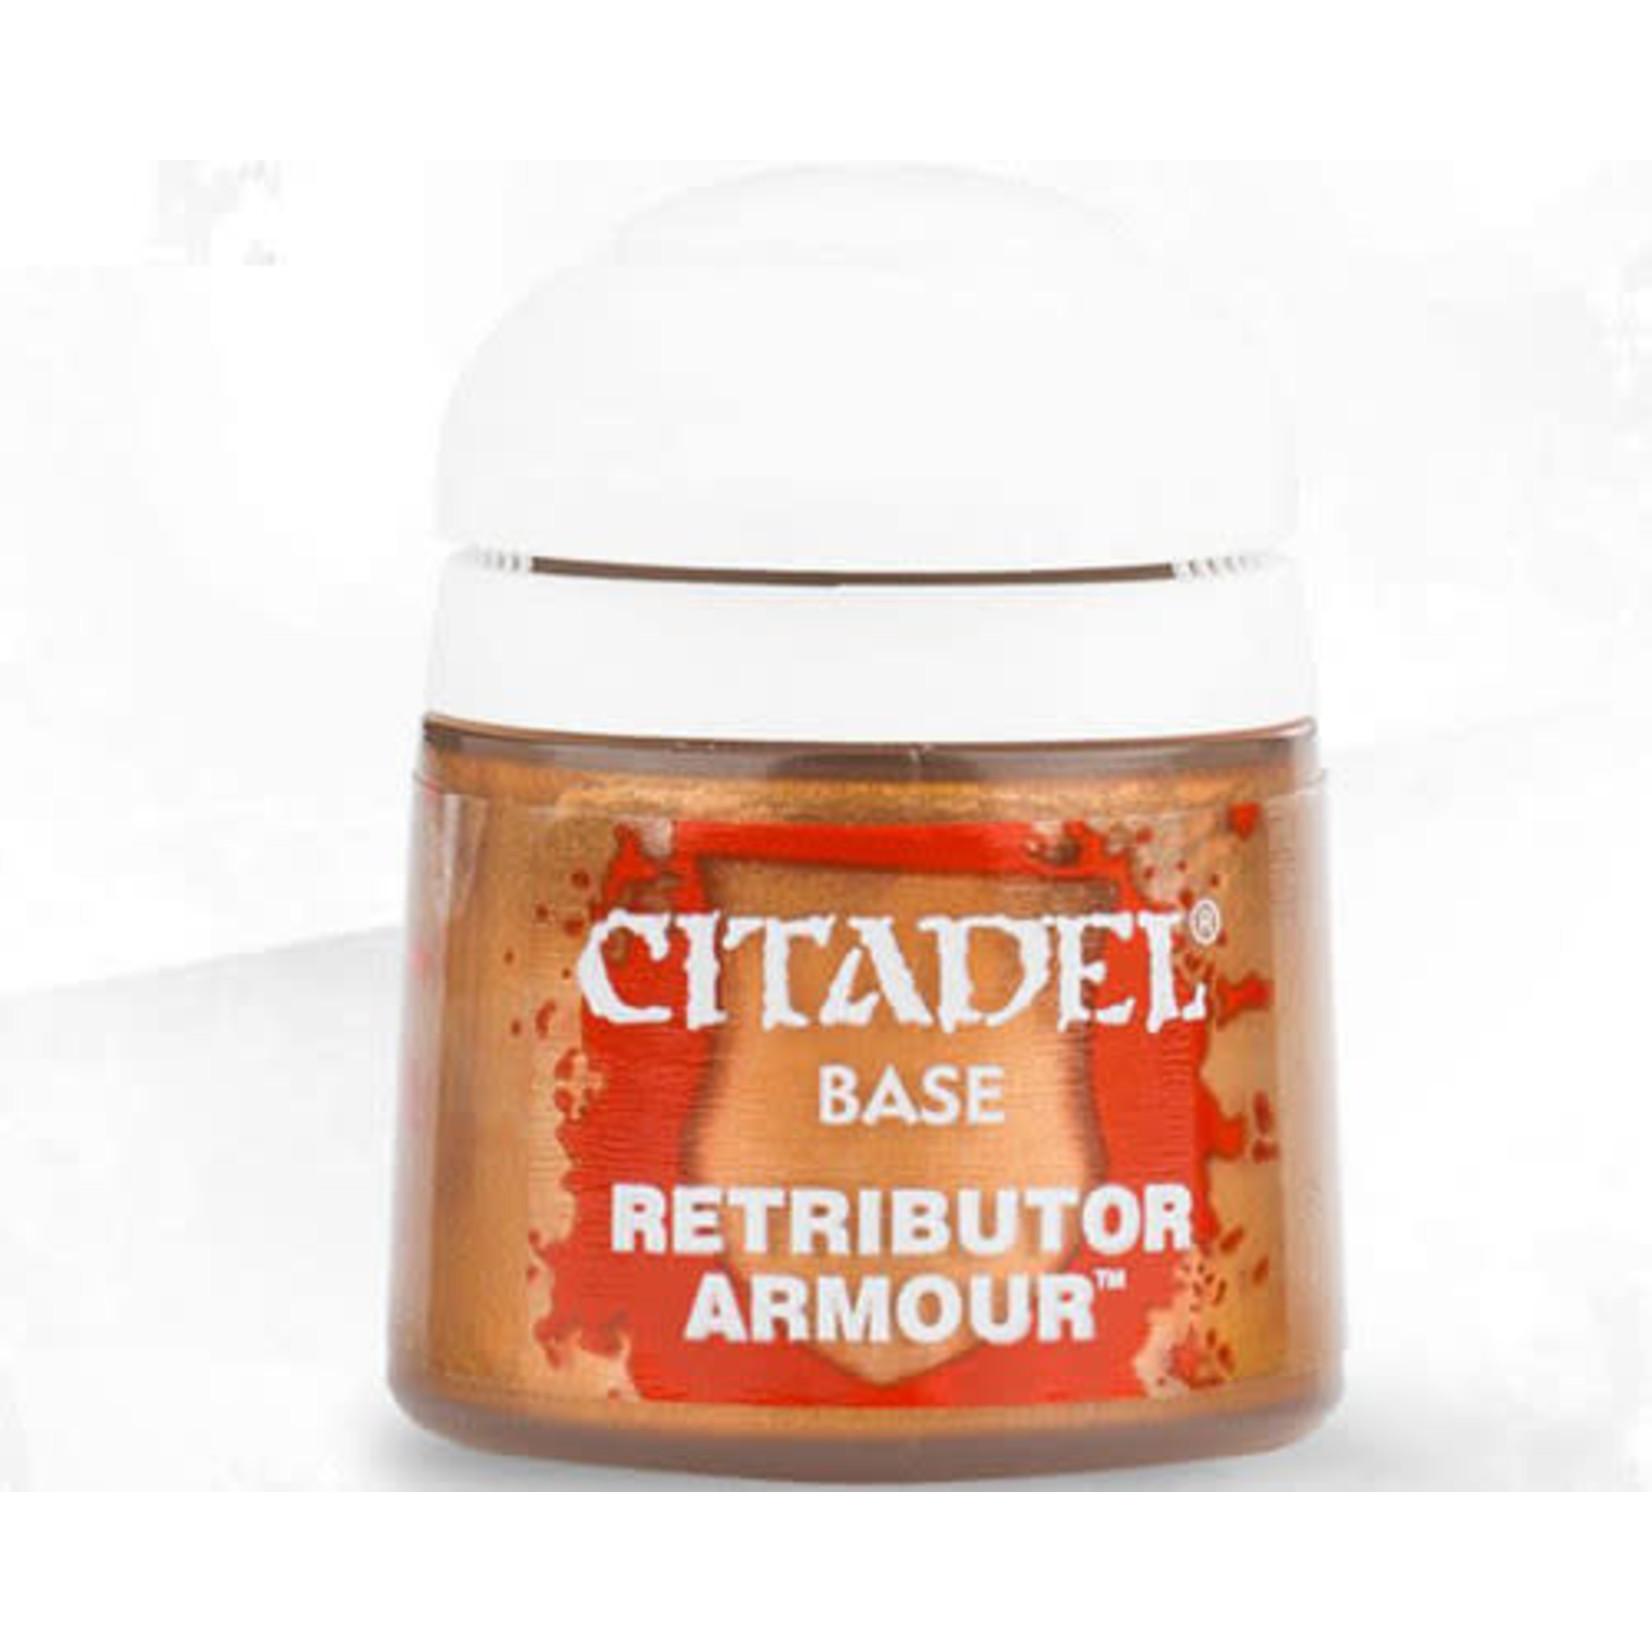 Citadel Citadel Paint - Base: Retributor Armour